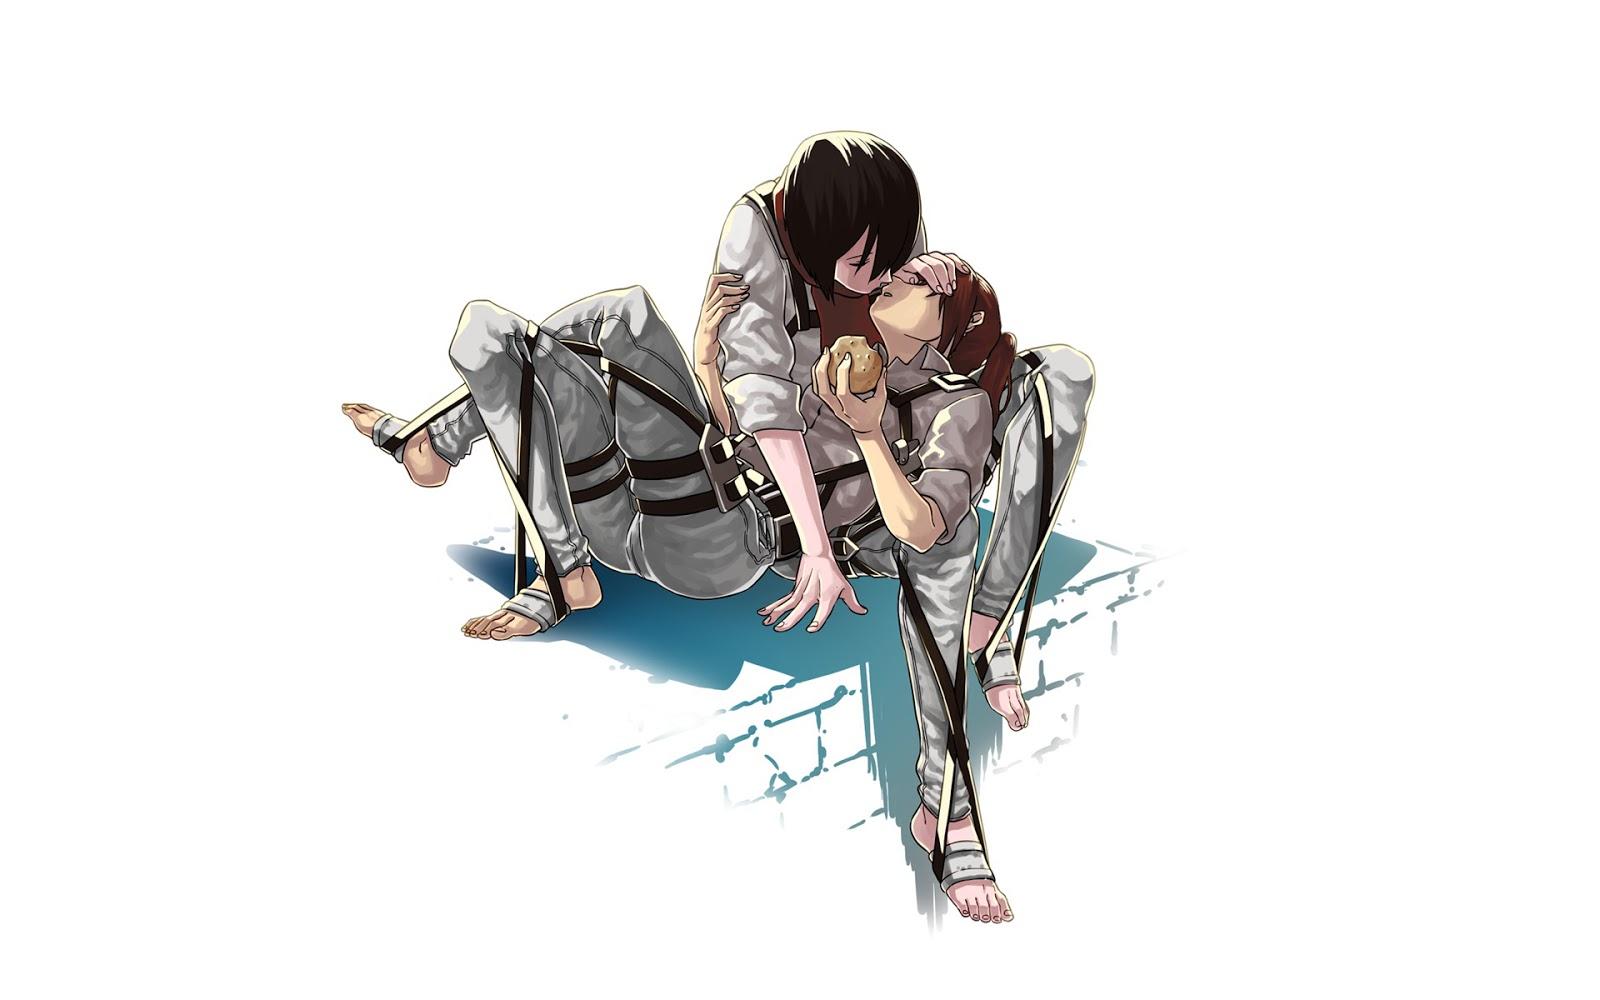 Untitled shingekinokyojin - Eren and mikasa wallpaper ...